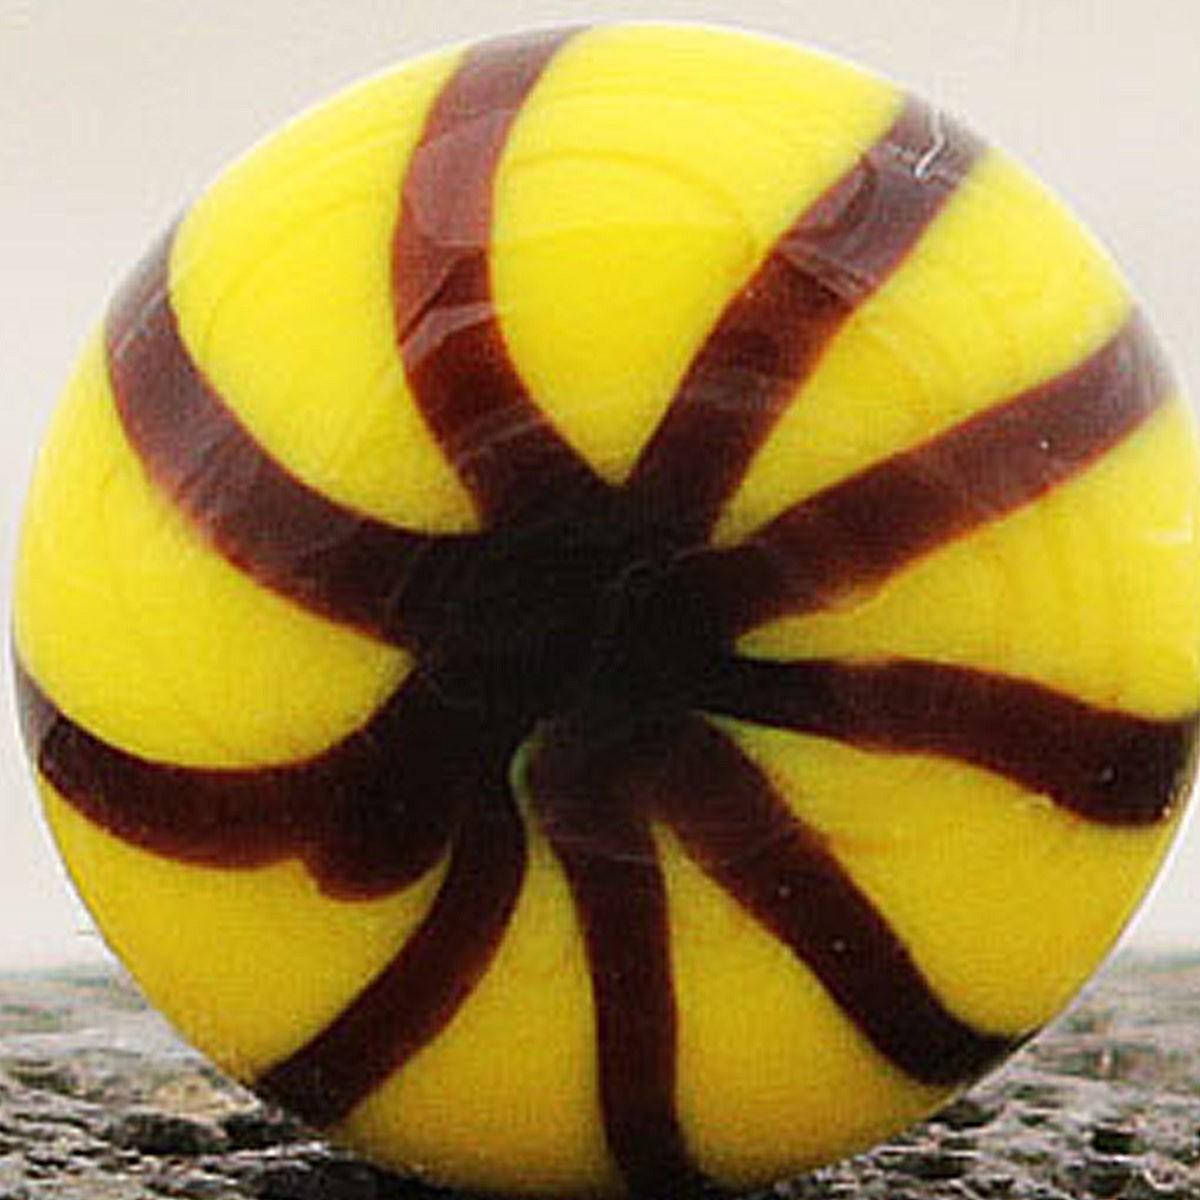 amarillo azufre con rayas negras dibujando un asterisco